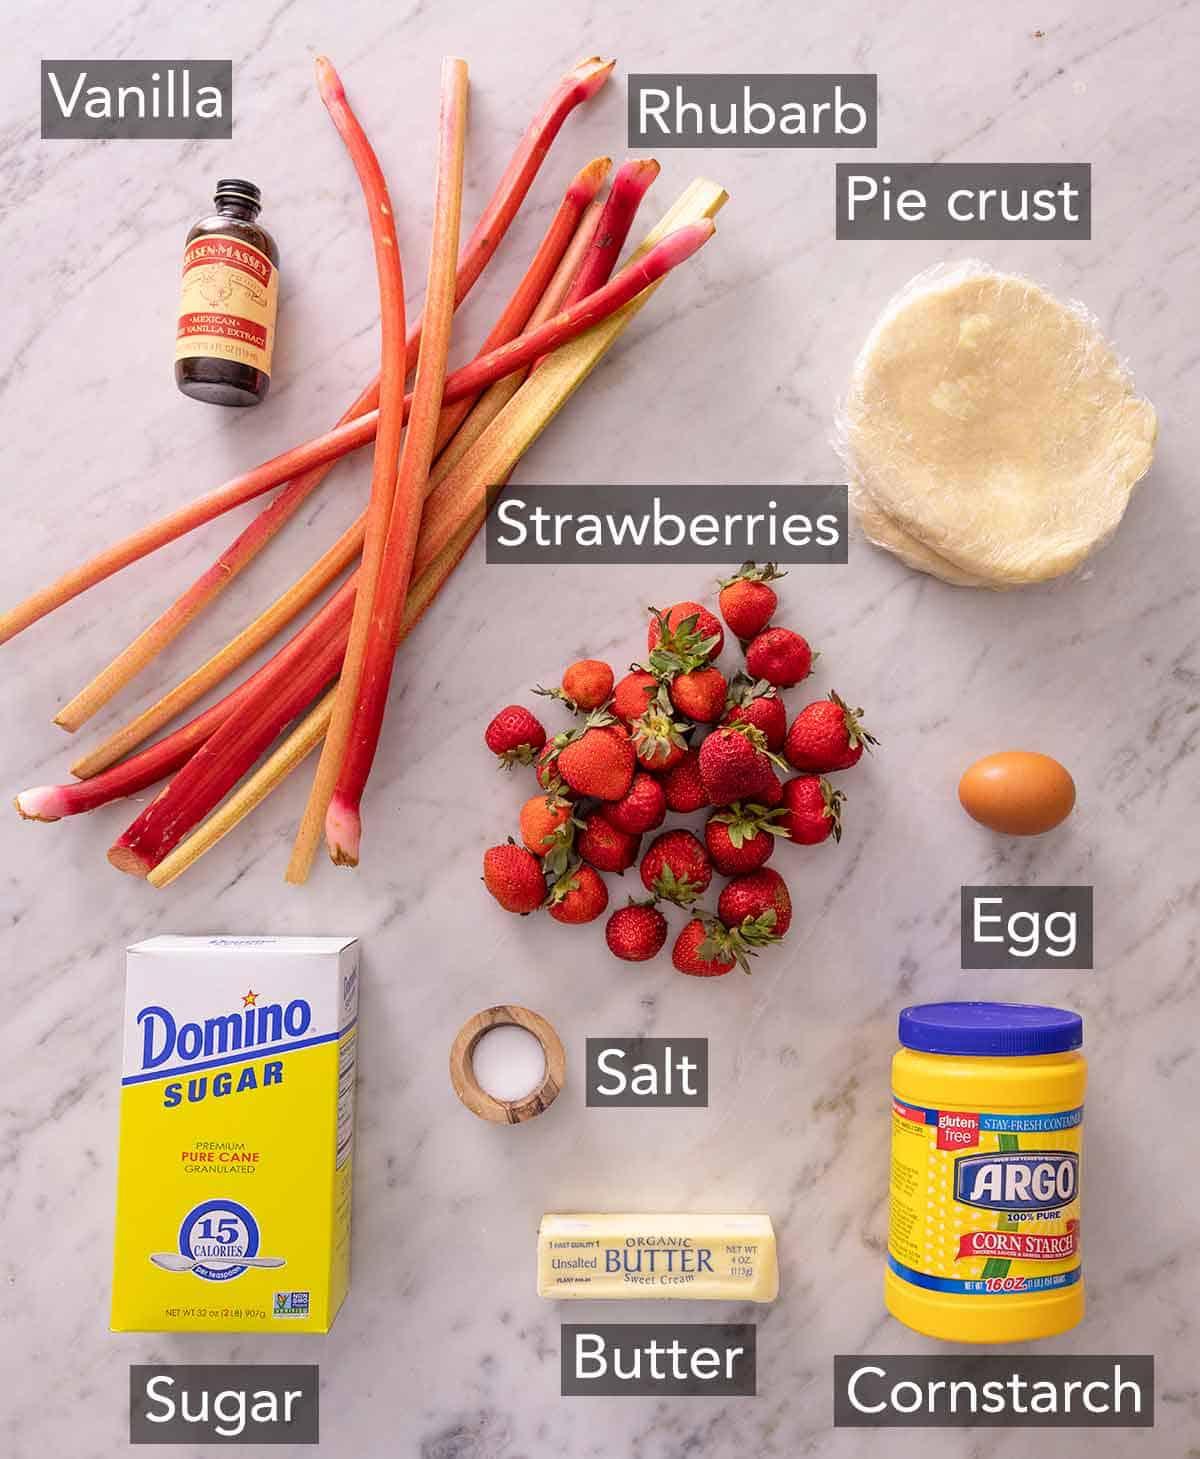 Ingredients needed to make strawberry rhubarb pie.